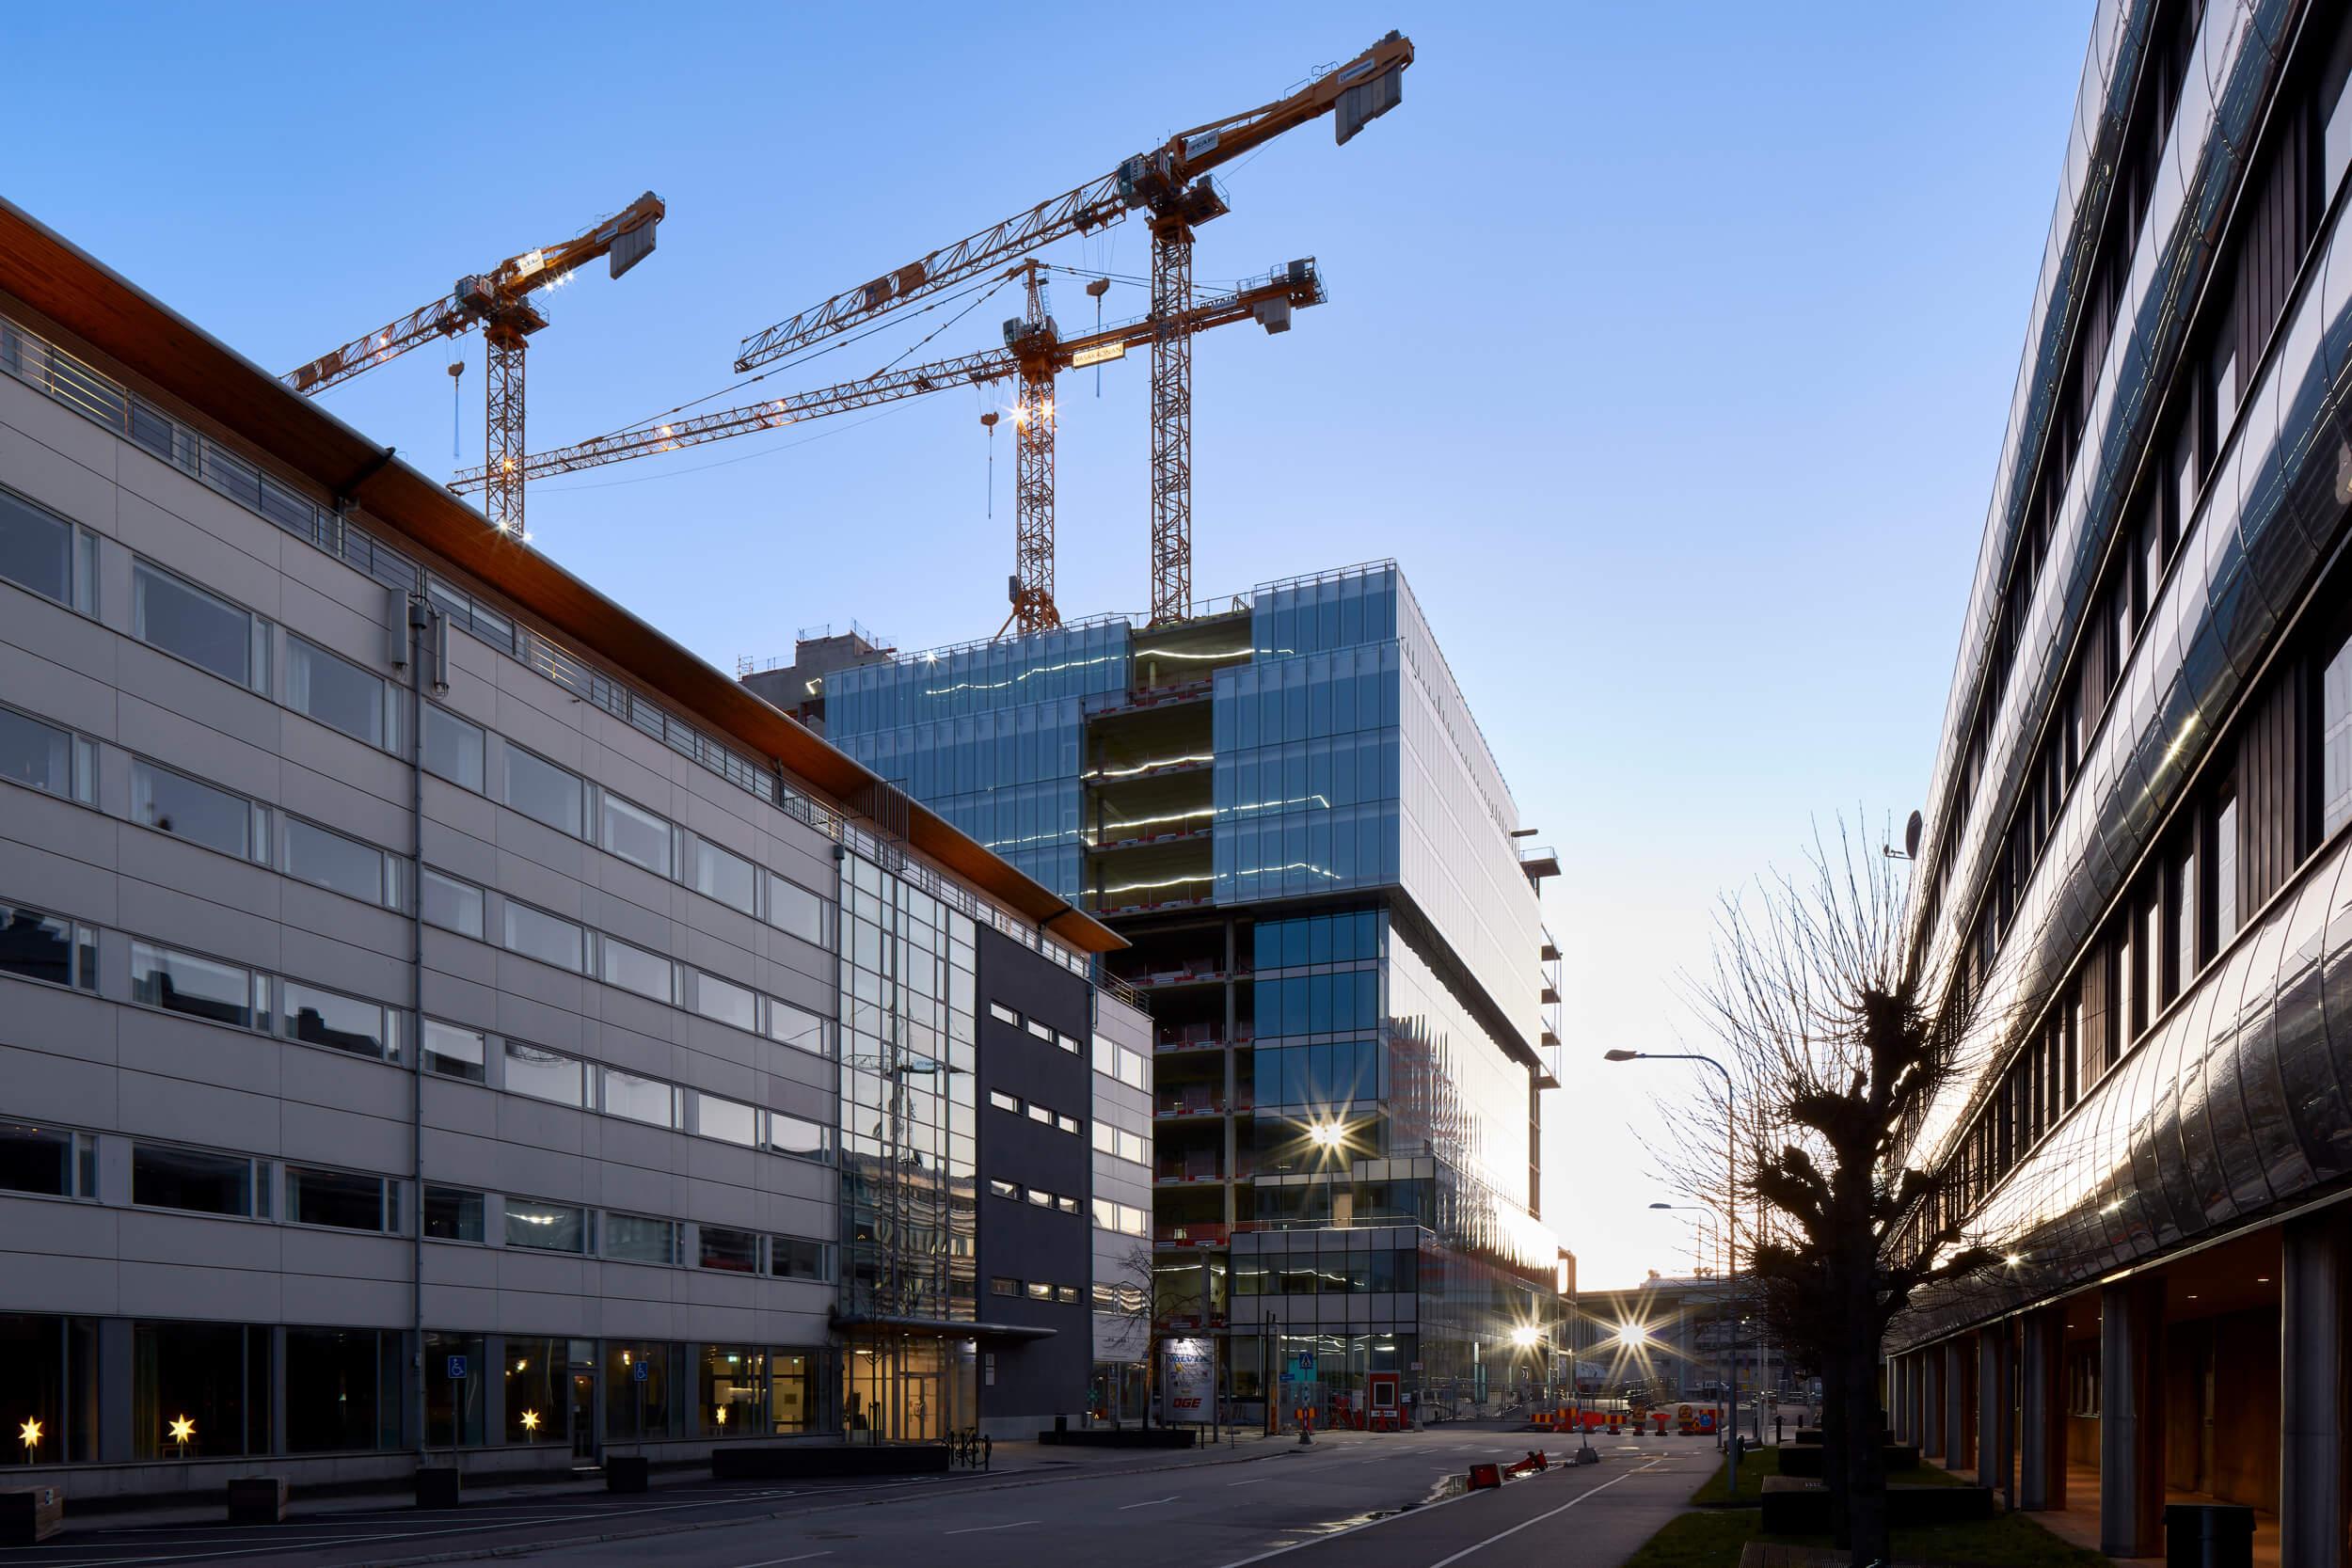 The Platinan<br>EGA<br>Erik Giudice Architects